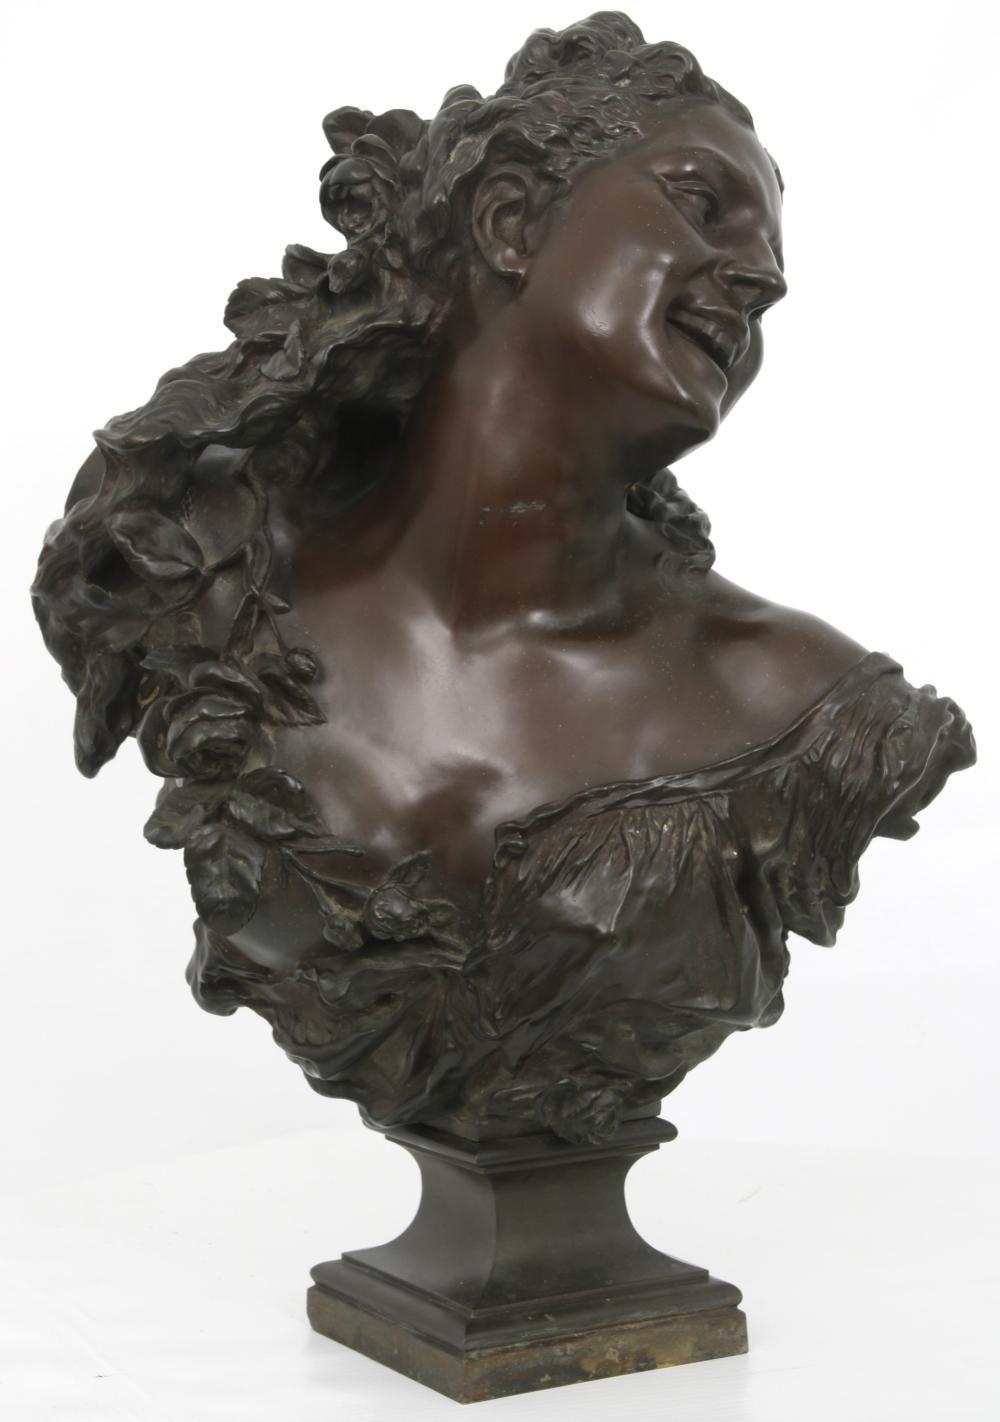 Jean-Baptiste Carpeaux (French, 1827-1875)